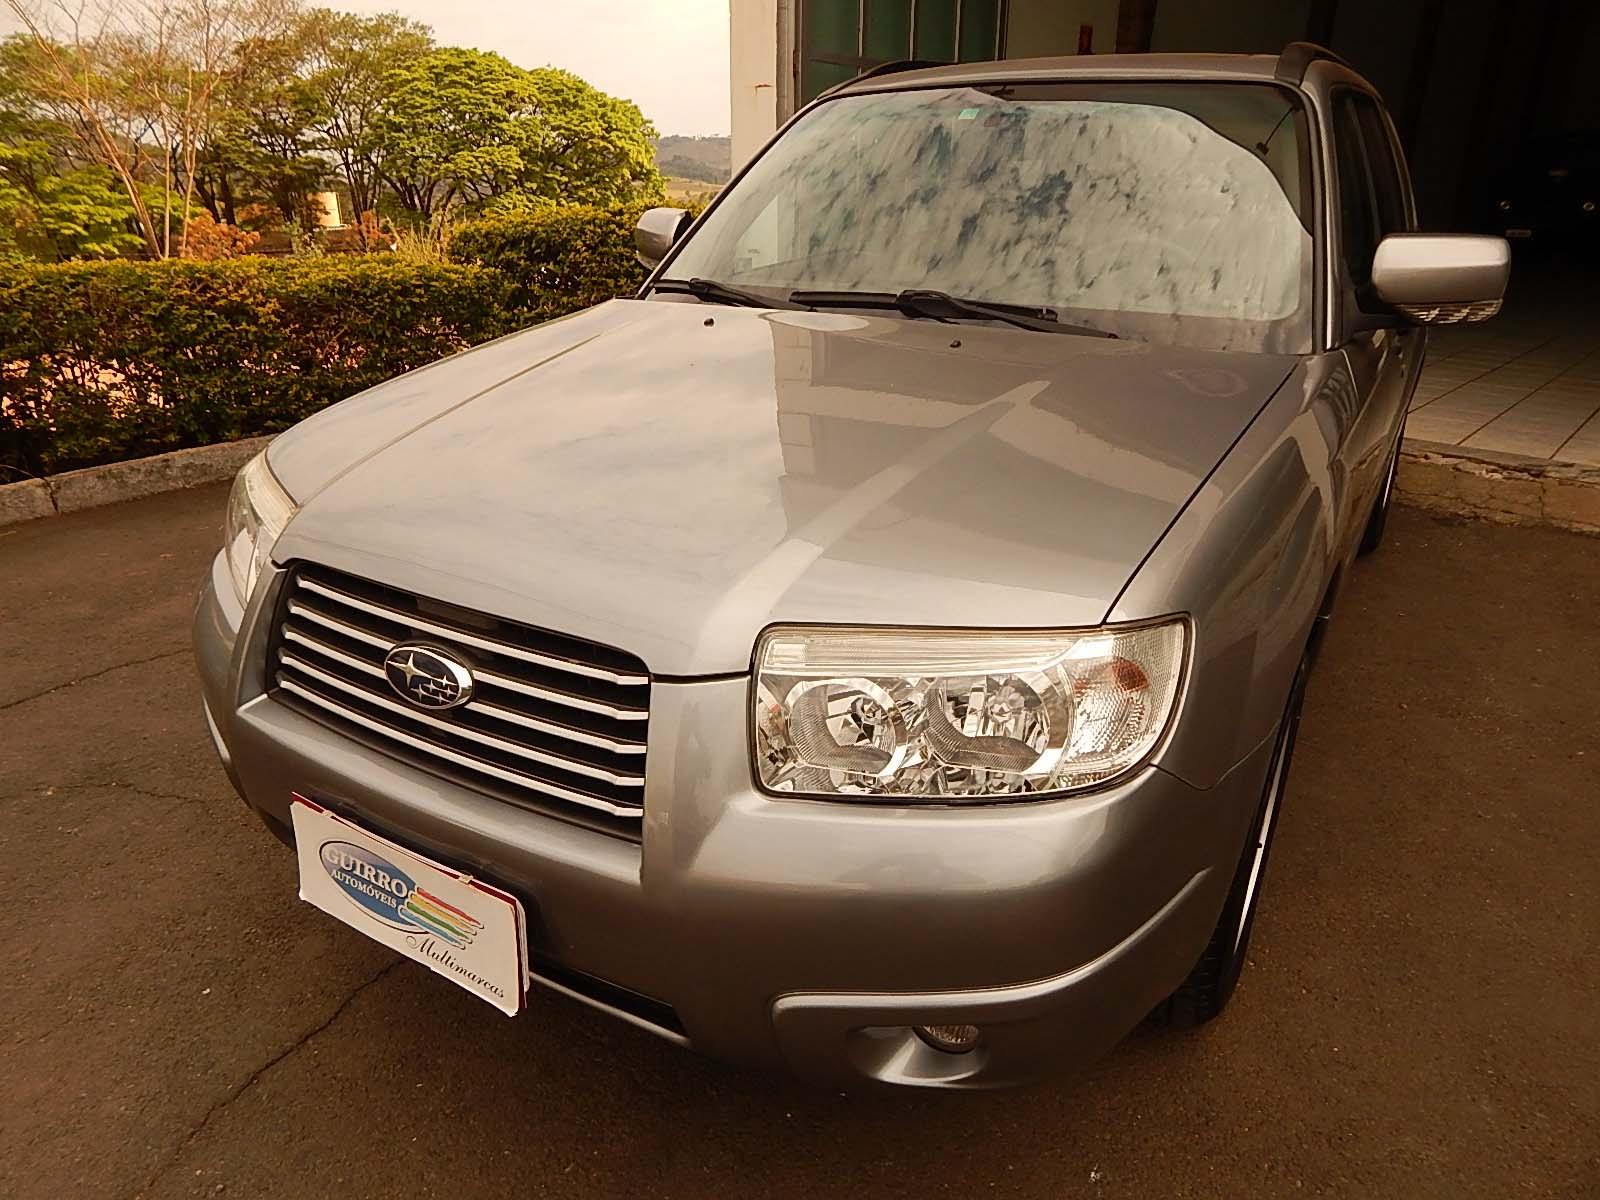 2007/2008 - Gasolina